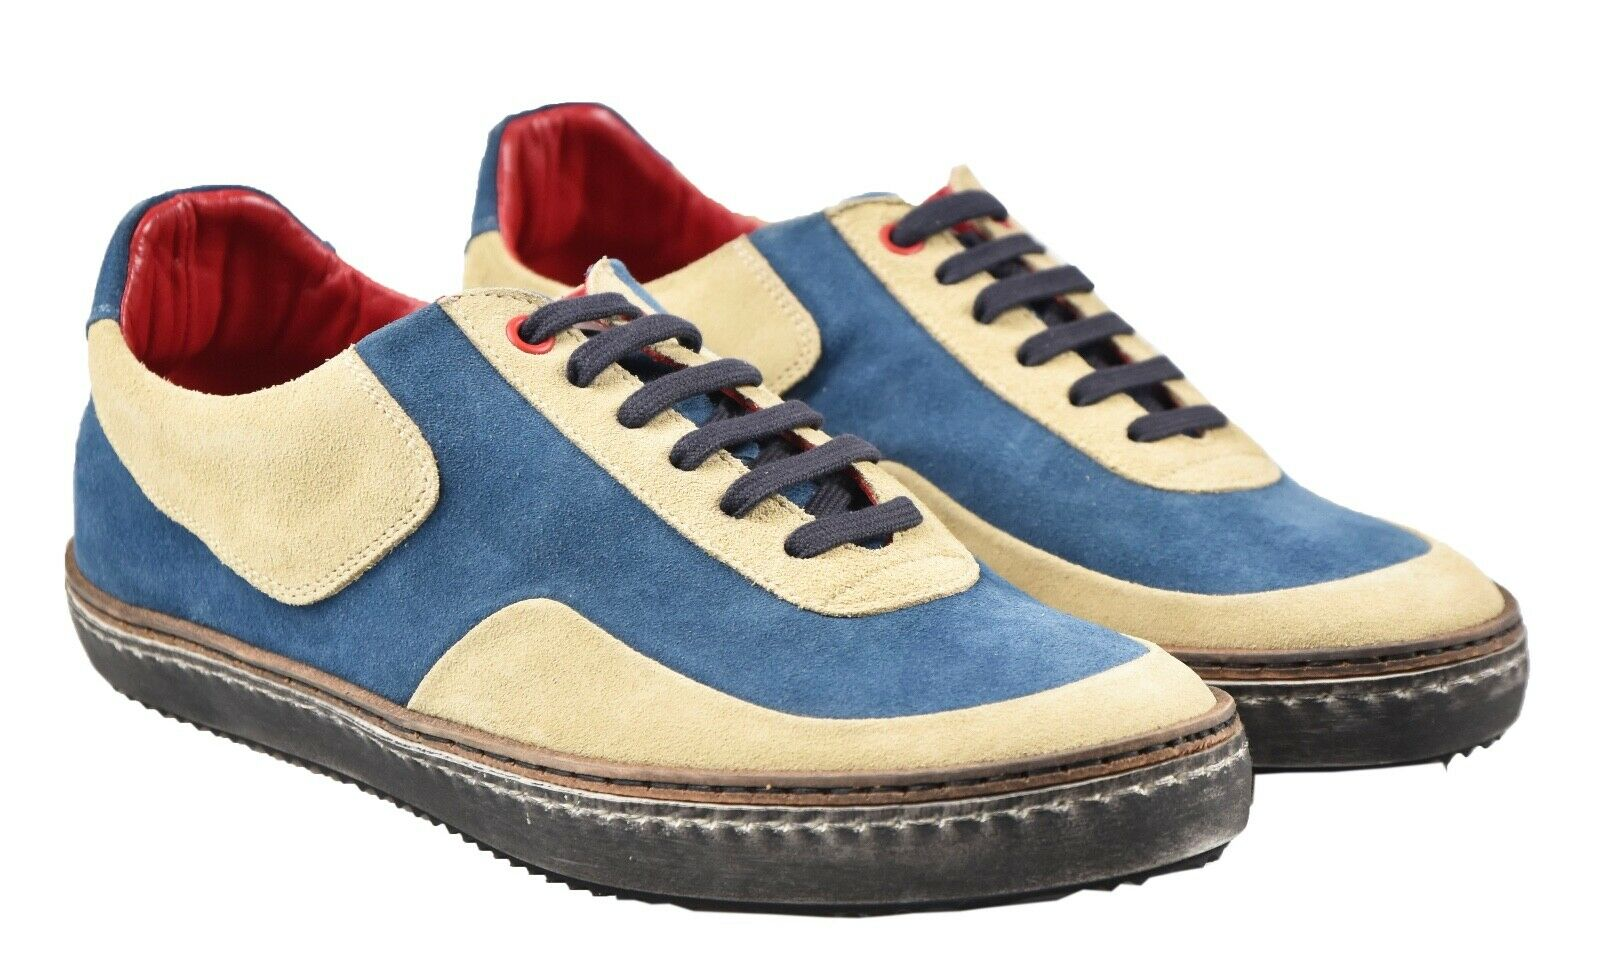 NEW KITON scarpe da ginnastica scarpe 100% LEATHER SZ 9 US 42 EU 19O137